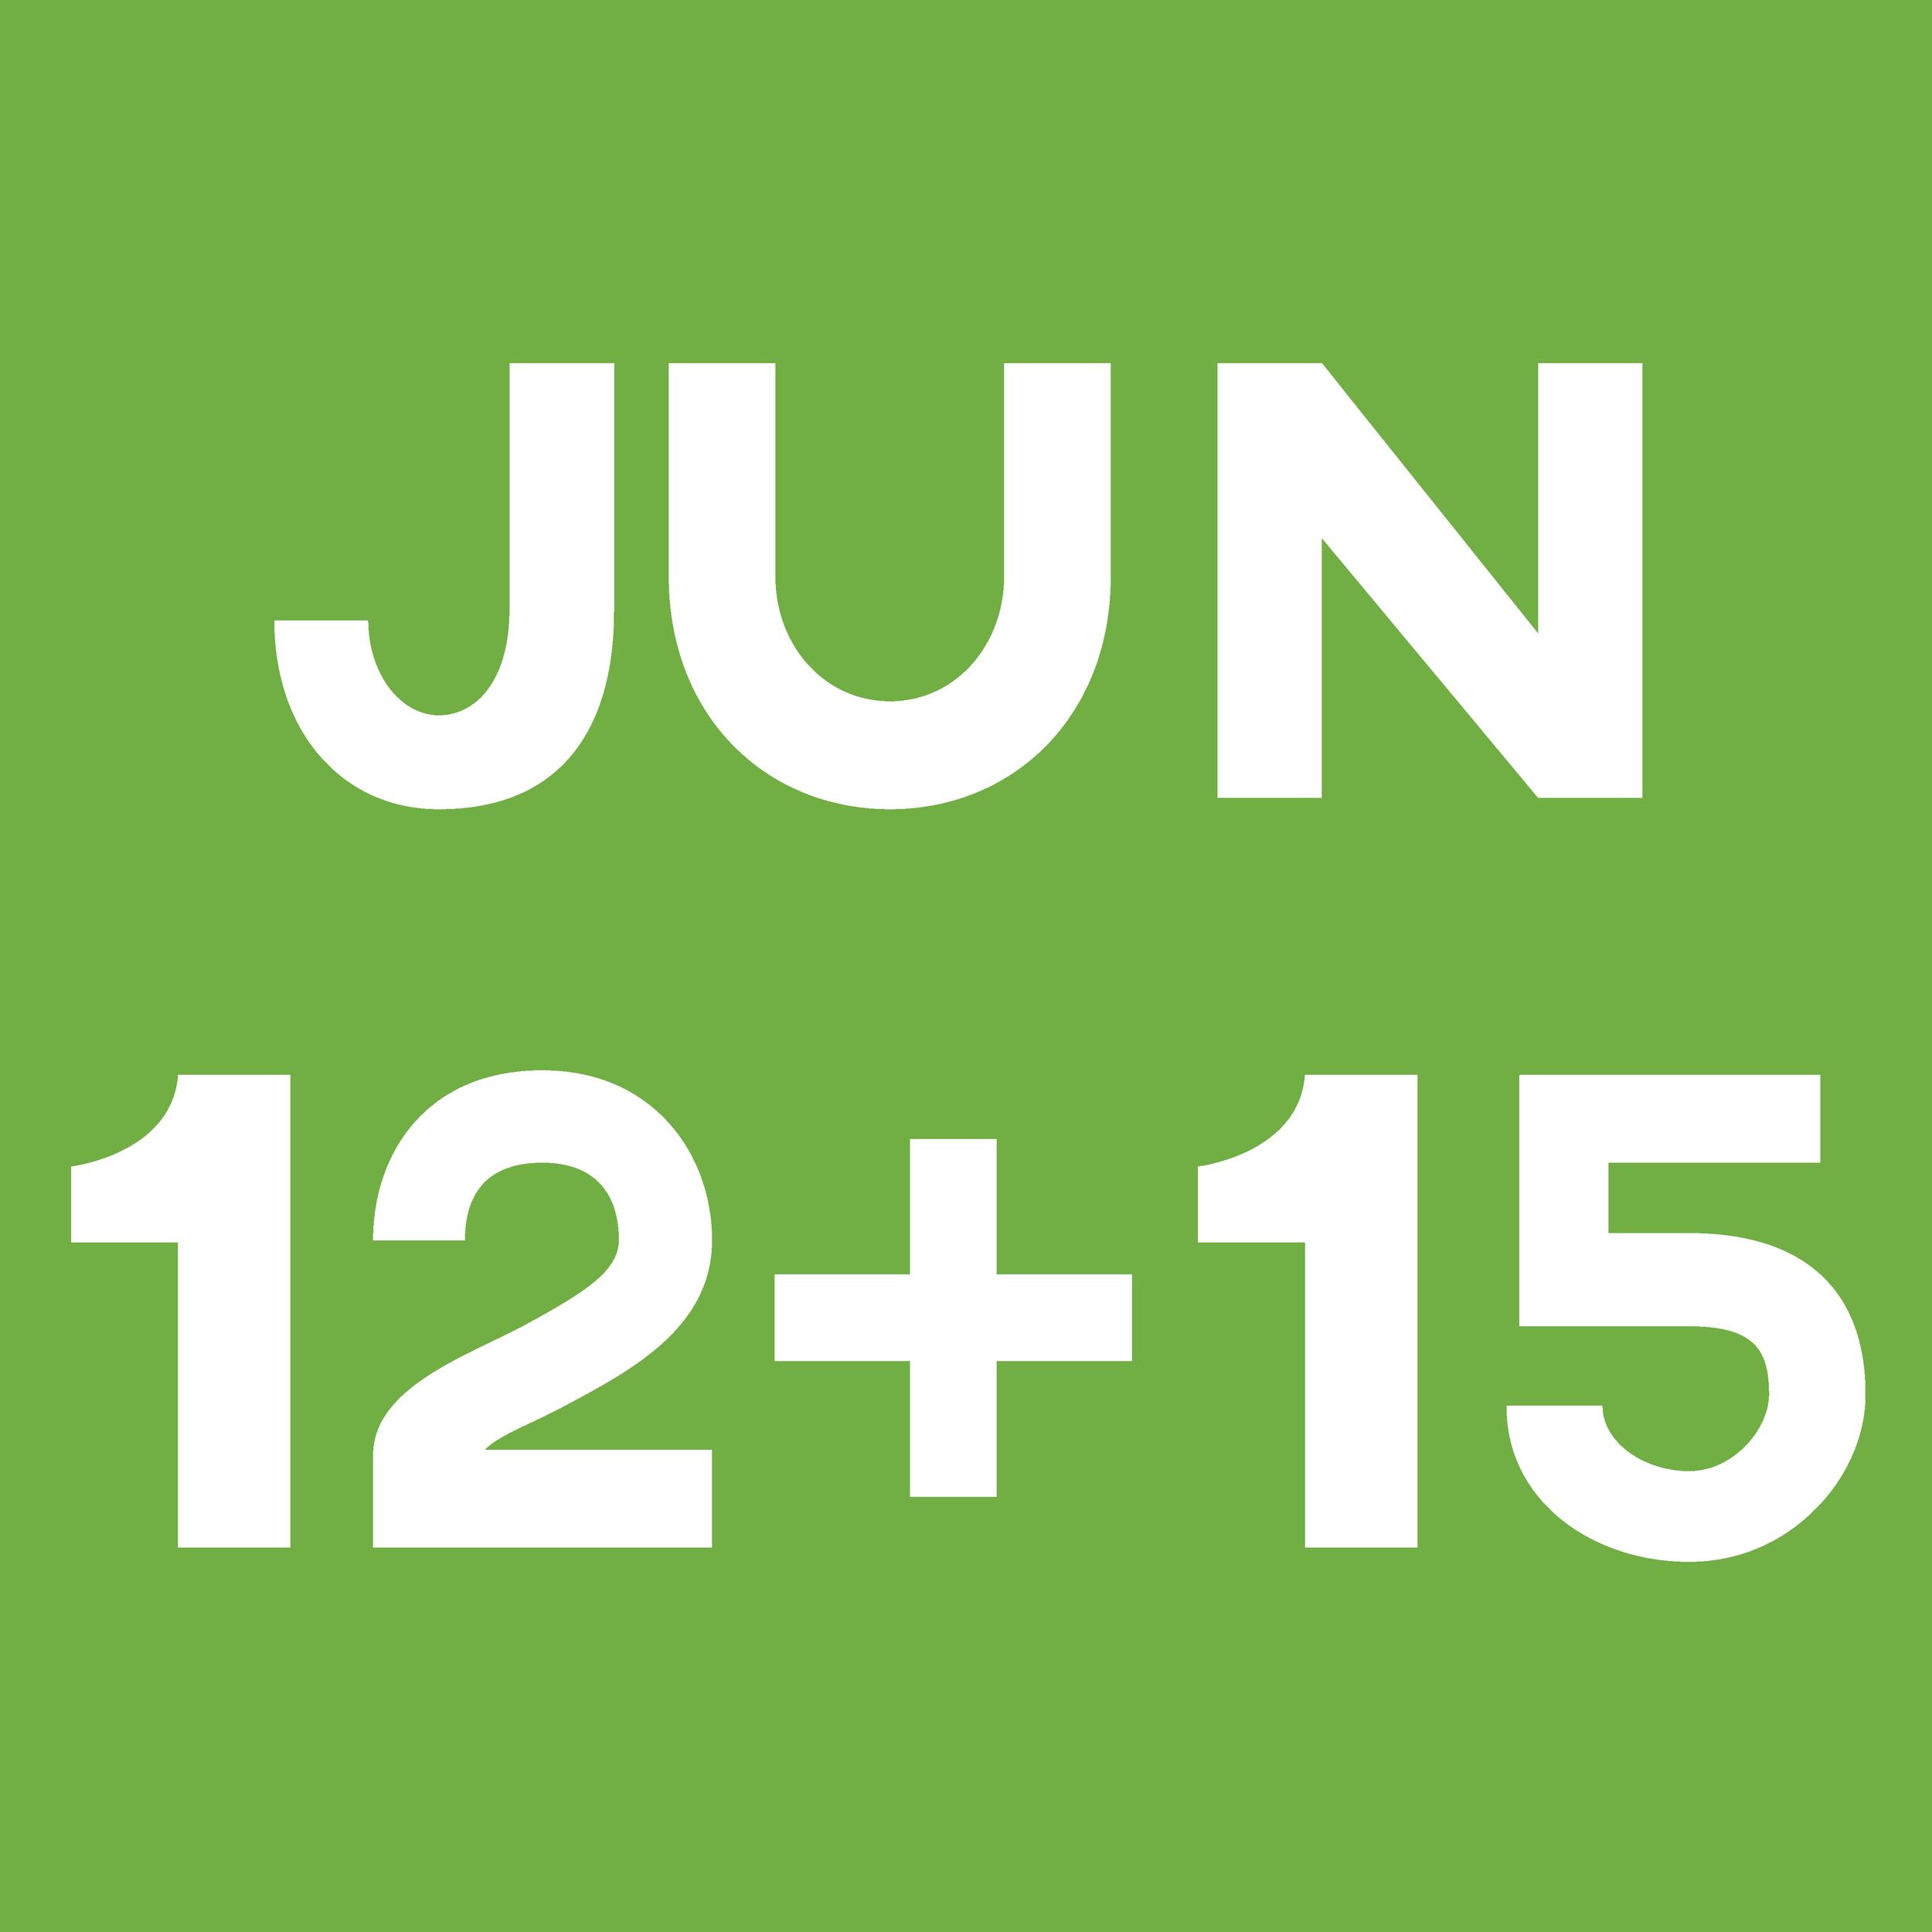 June 12 + 15 Green Data Block